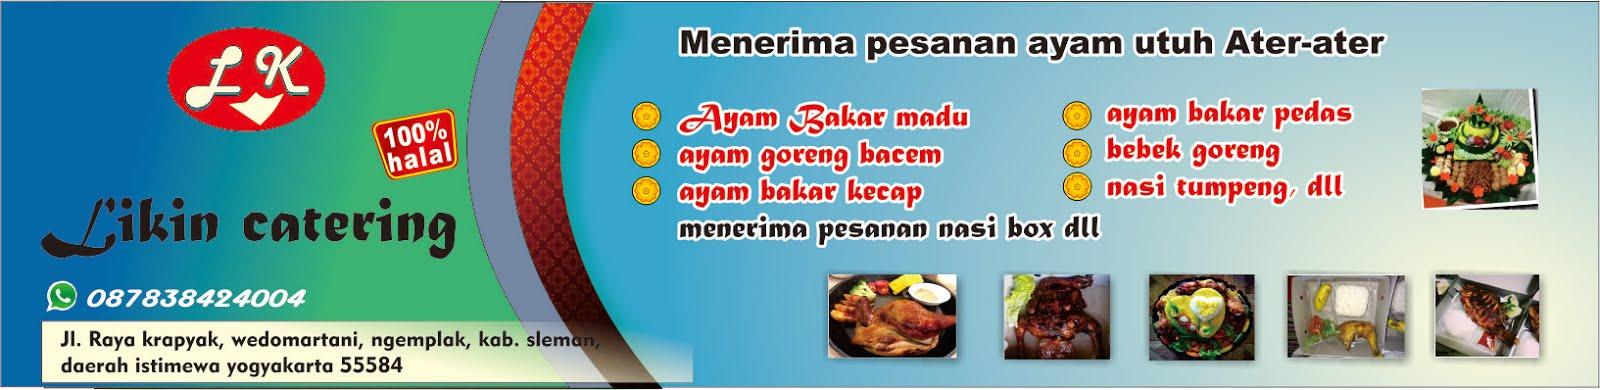 Catering Jogja-Sleman-Bantul